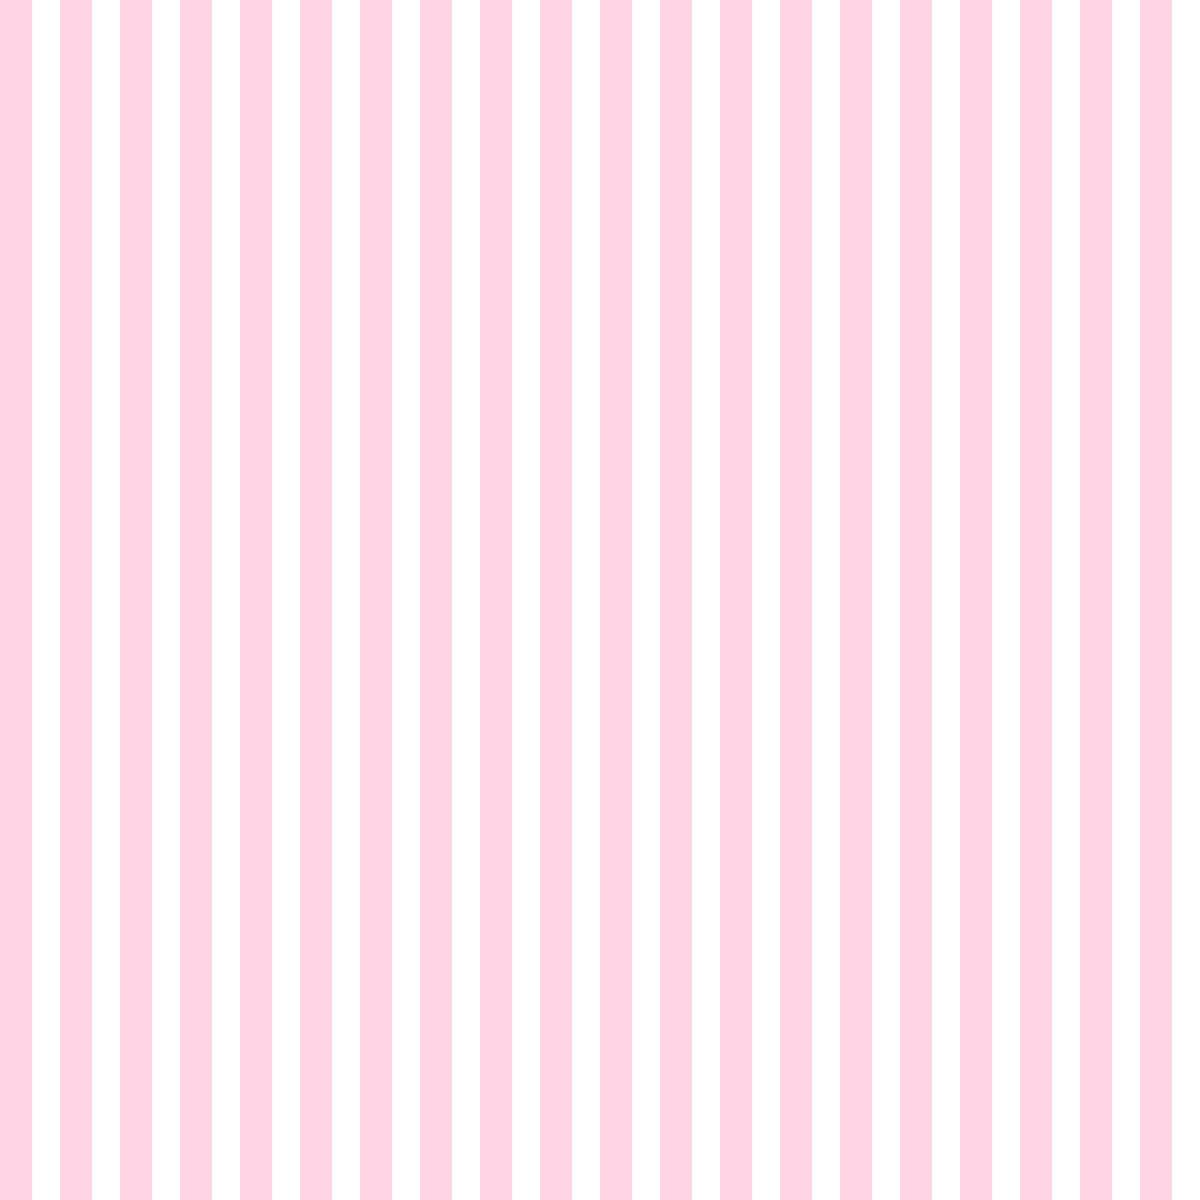 Pink pattern stripes - photo#5